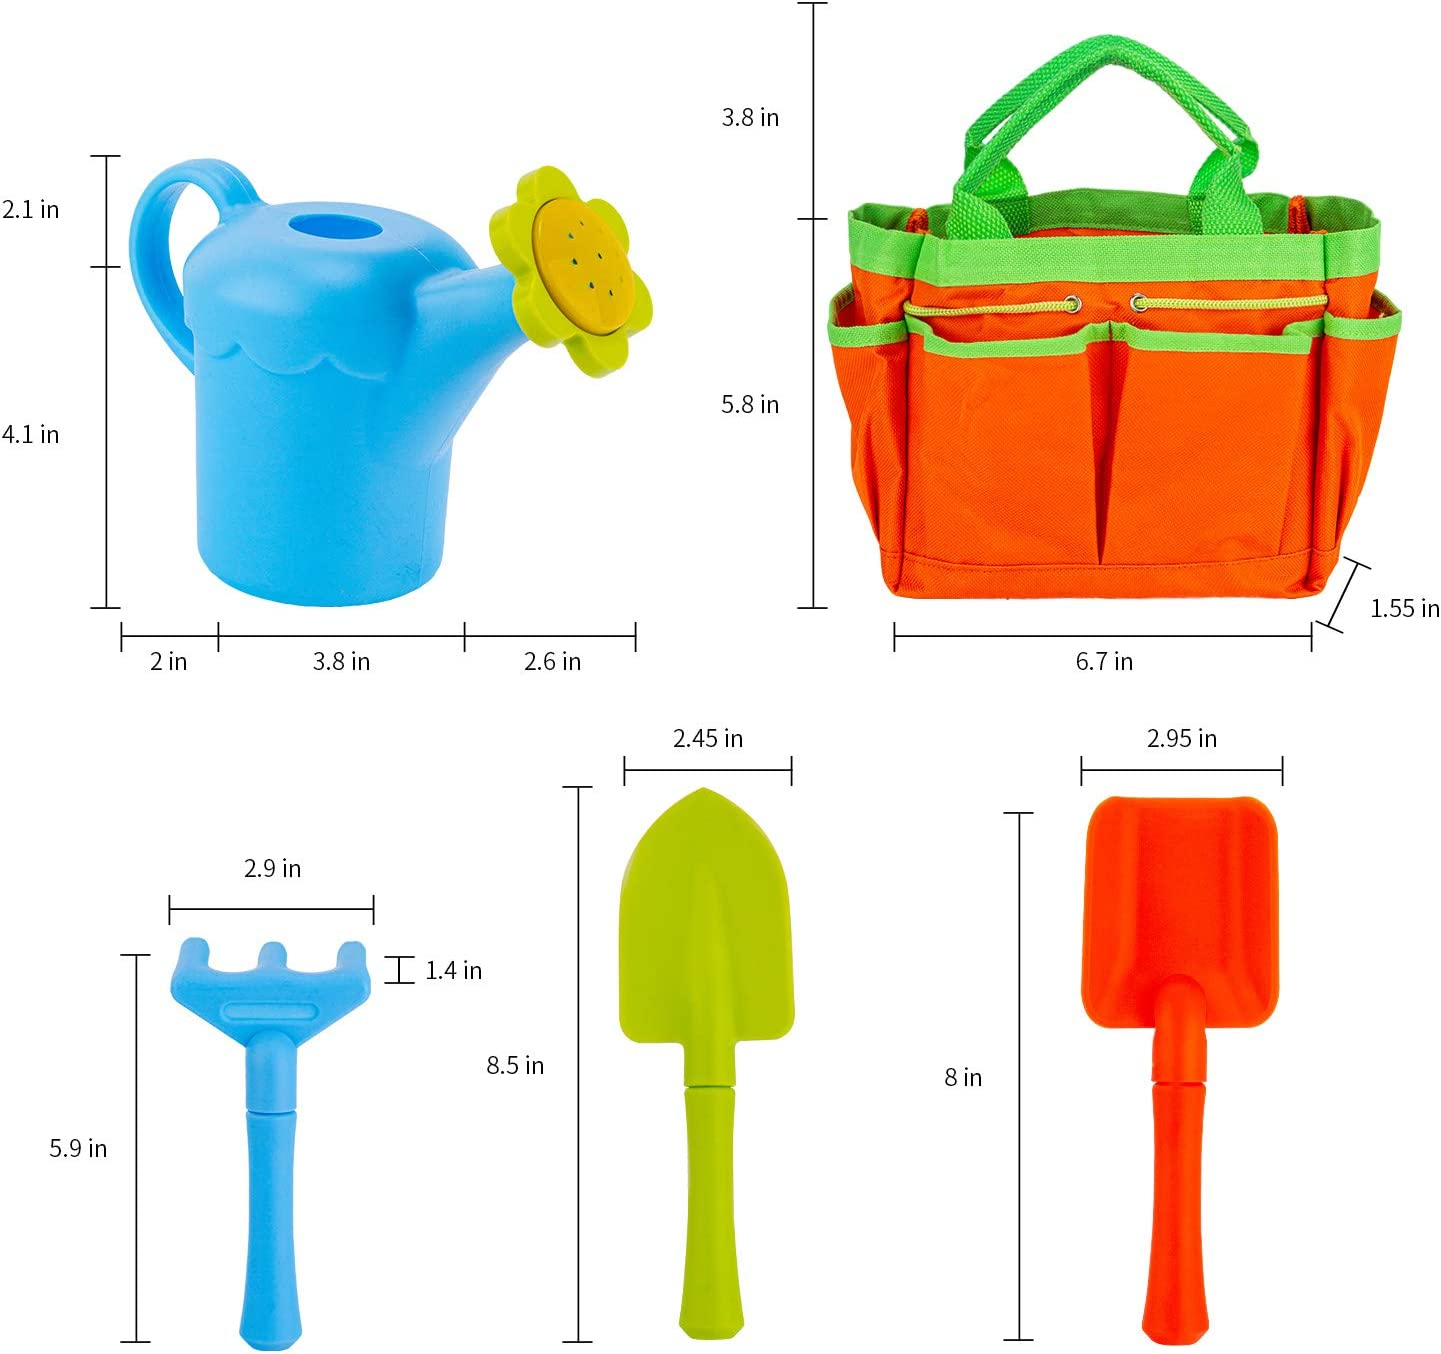 Garden Toe Bag and Apron Shovel Sun Hat Gardening Gloves Rake Trowel MoTrent Children Gardening Tools Set 8 PCS Kids Garden Tool Toys Including Watering Can